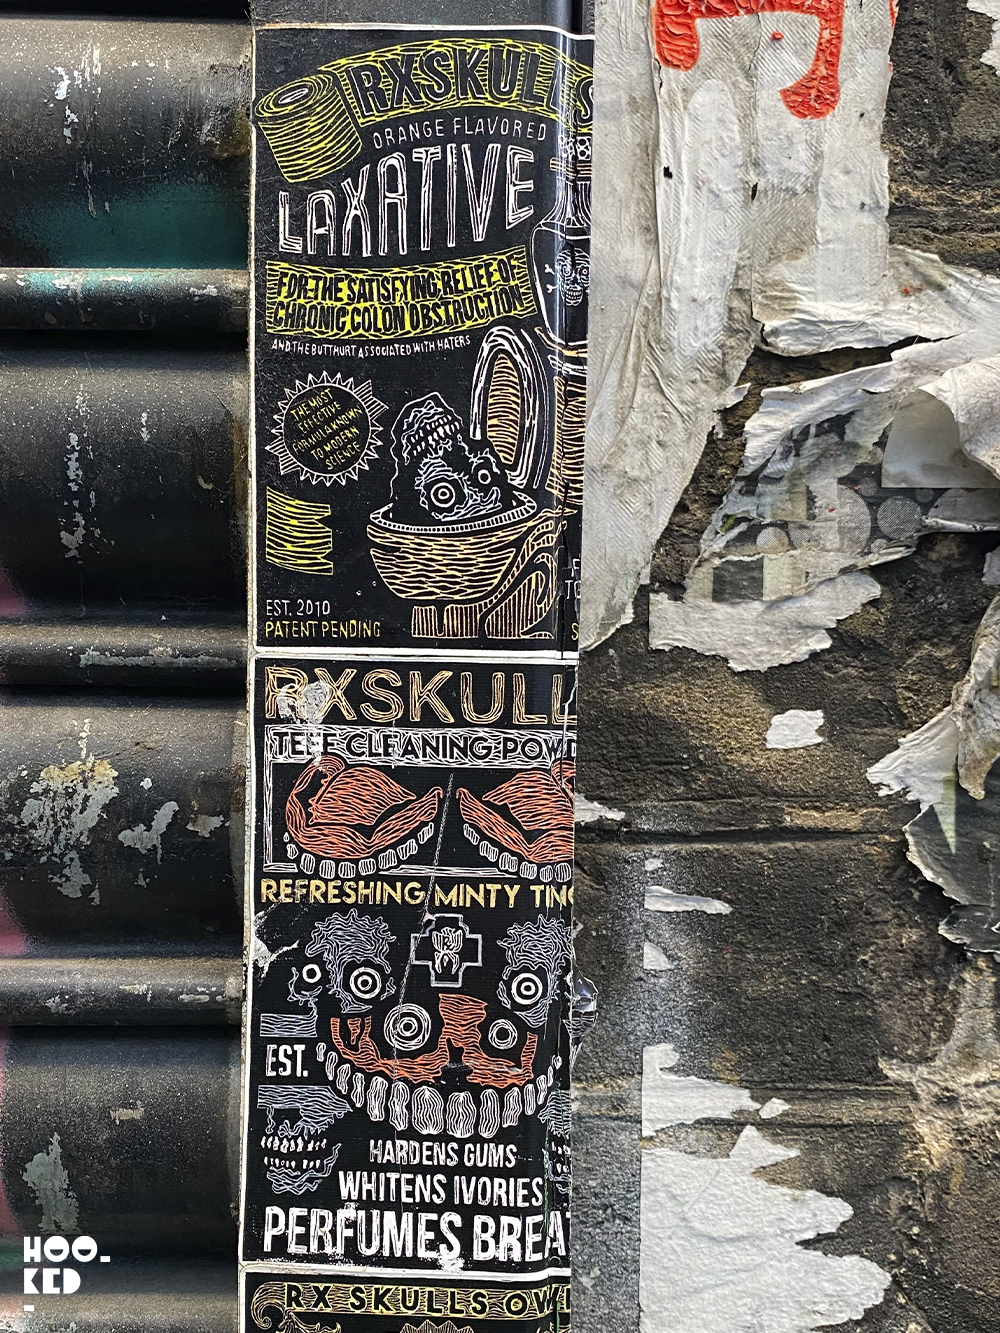 England - London street art stickers by artist RX Skull